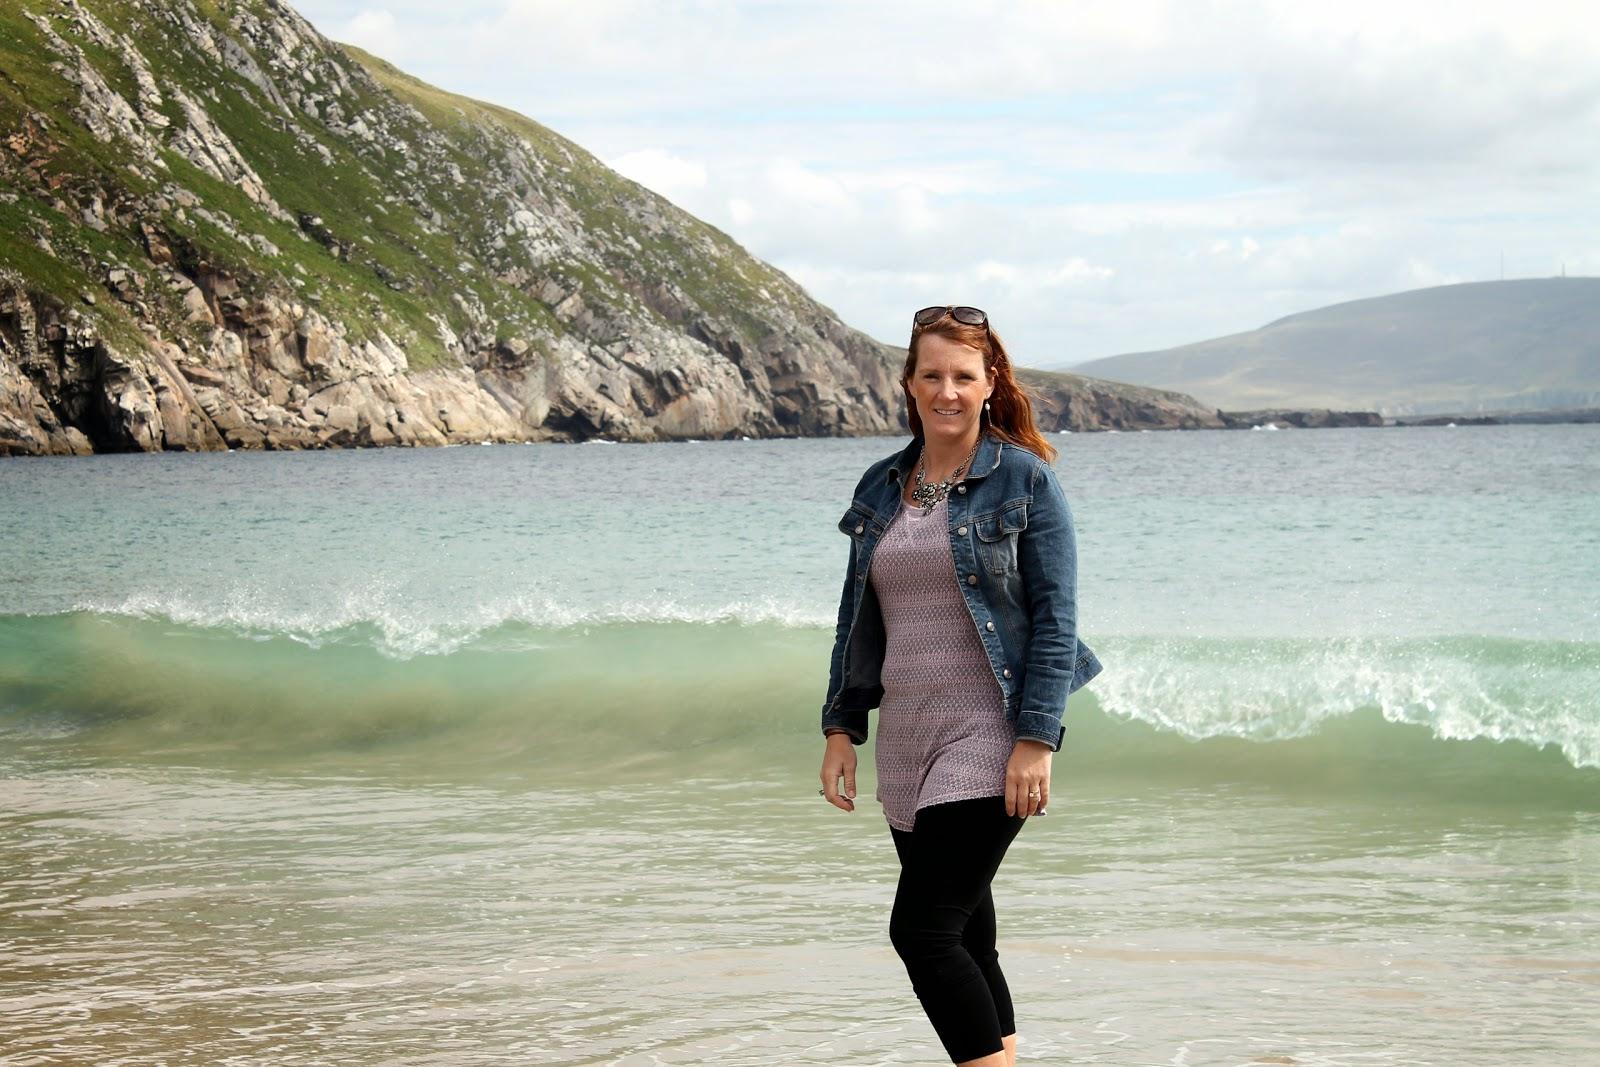 Anniversary Trip to Ireland Part 2, diy, Ireland, selfdrive, tour, wanderlust, travel, overseas, hiking, adventure, outdoors, beauty, landscape, sheep, torq waterfall, keem beach, achill island, skelligs, bray head loop, cliffs of mohr, westport, coblers bar, wyatt hotel, seafood, bella vita, kilbeggan irish whiskey, dublin, river lifey, ryans, anniversary, diy, Hiking., Ireland, national park, ocean, vacation, killarney national park, Ring of Kerry